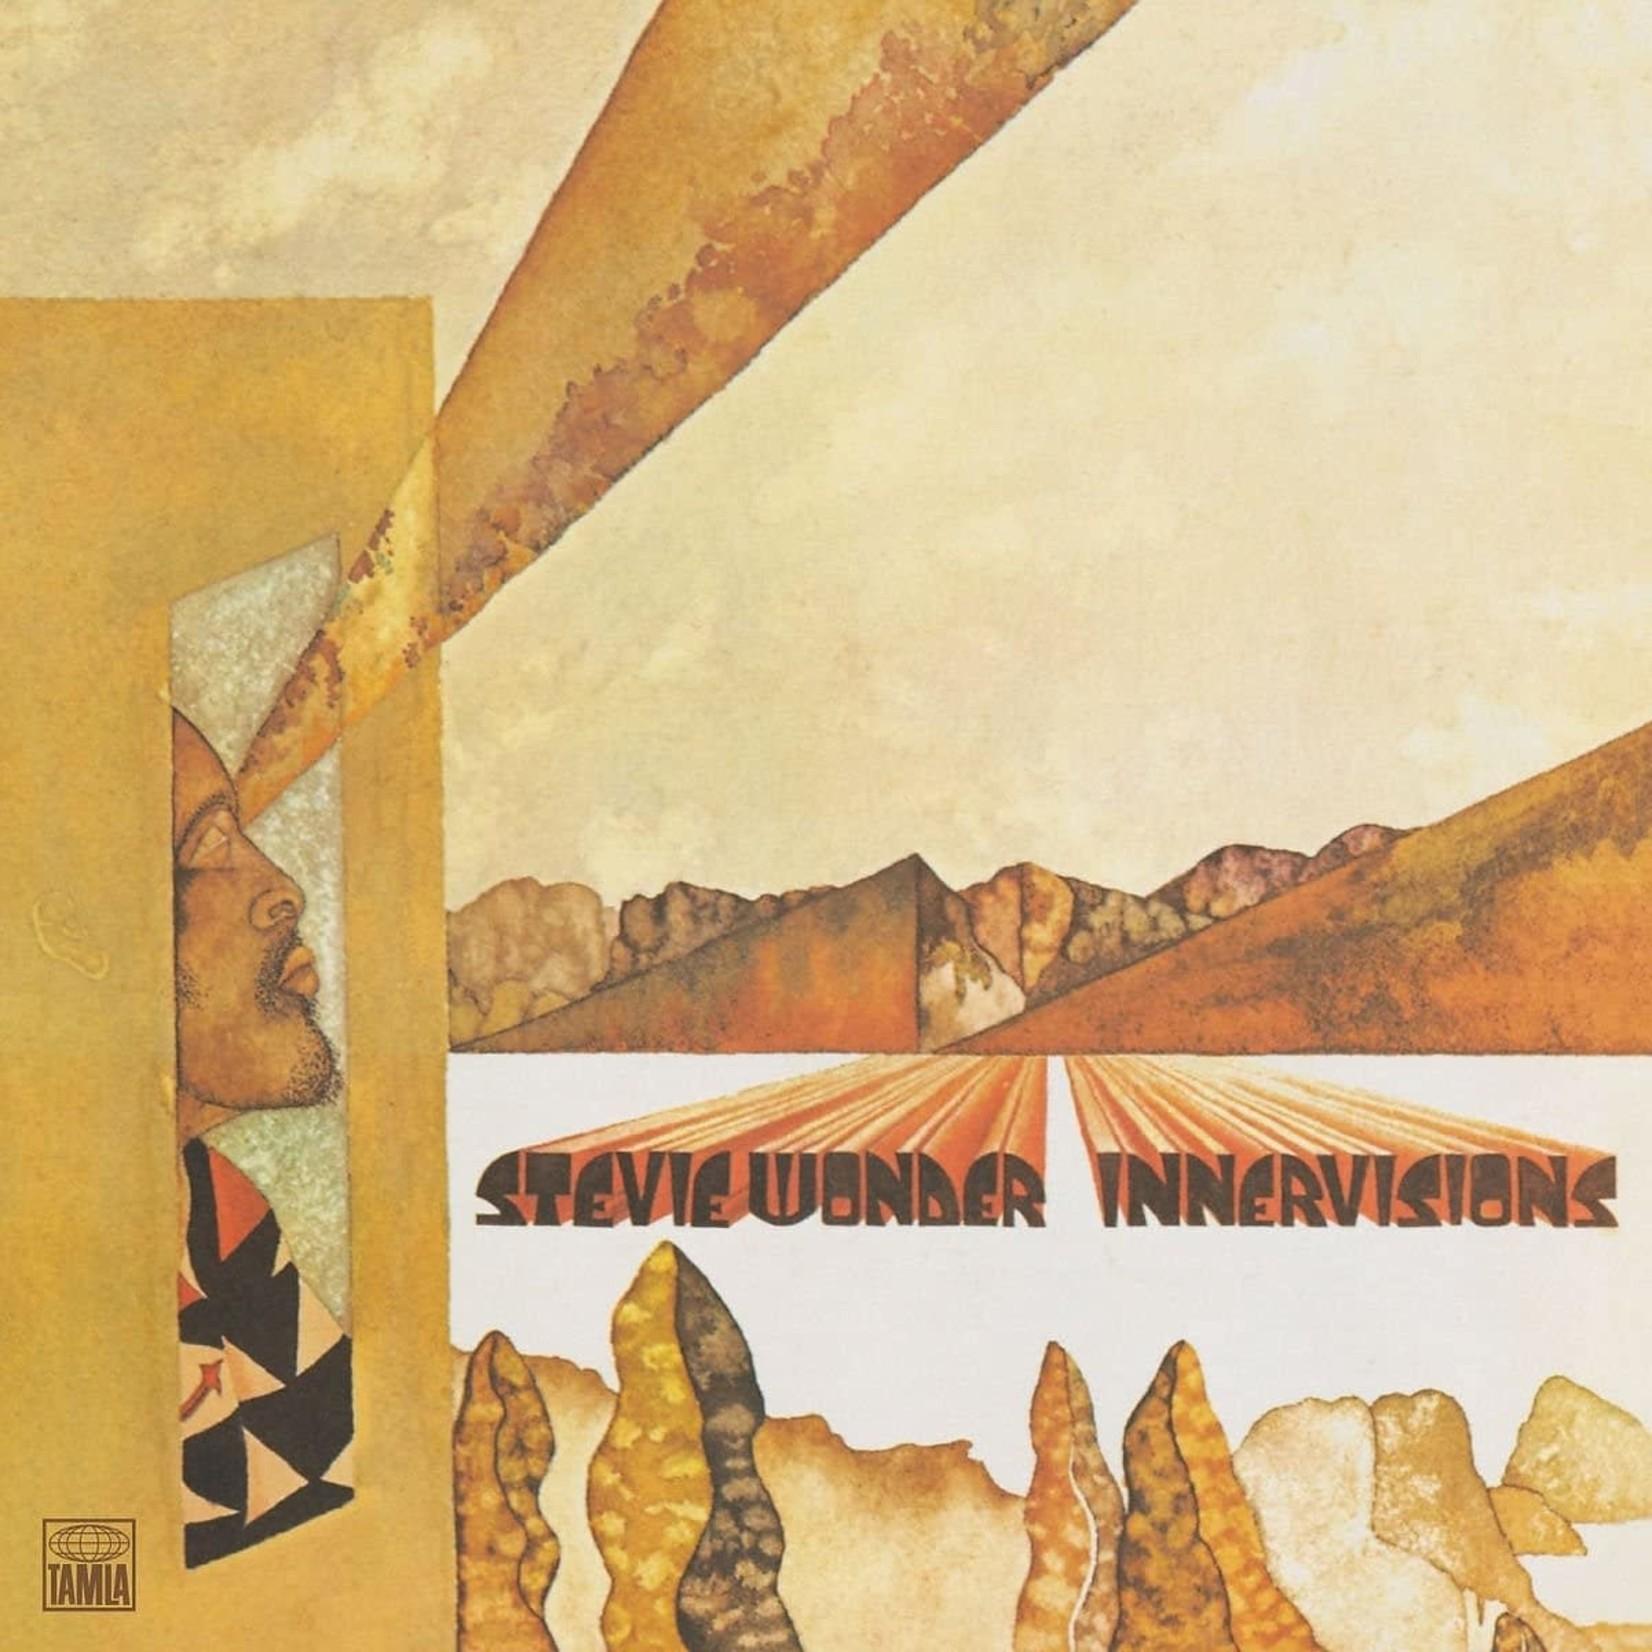 [Vintage] Wonder, Stevie: Innervisions